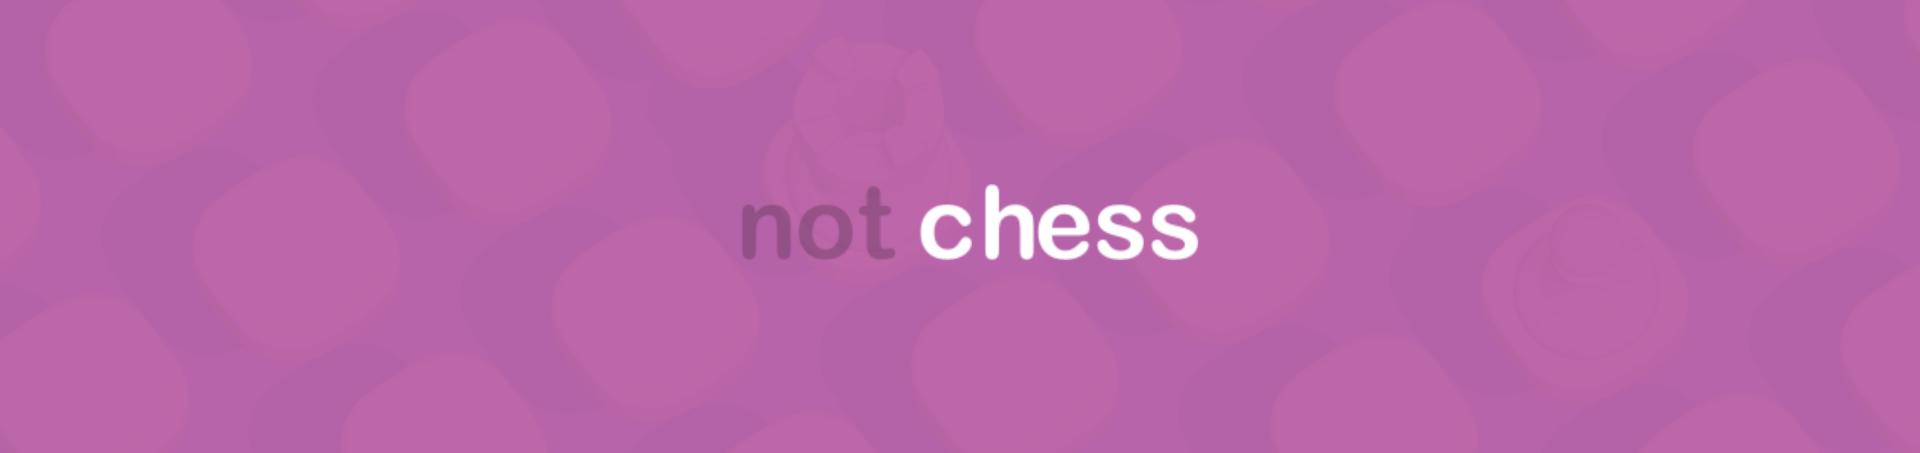 Not Chess